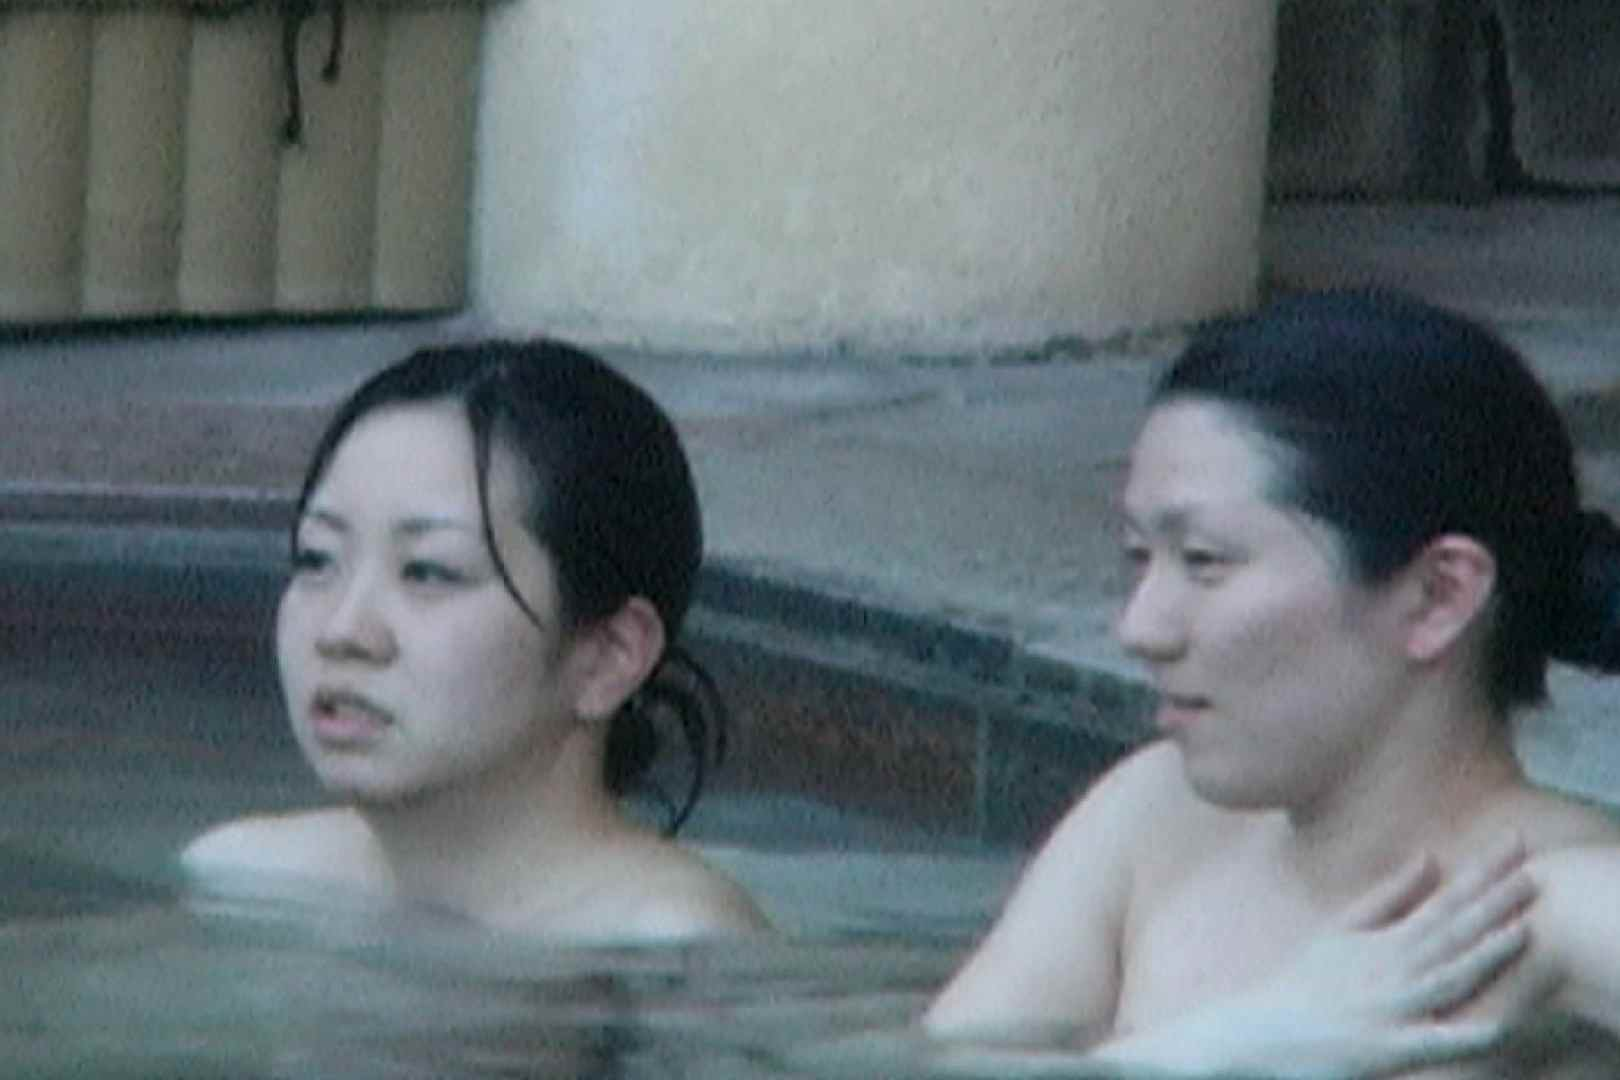 Aquaな露天風呂Vol.598 HなOL | 露天  55pic 16